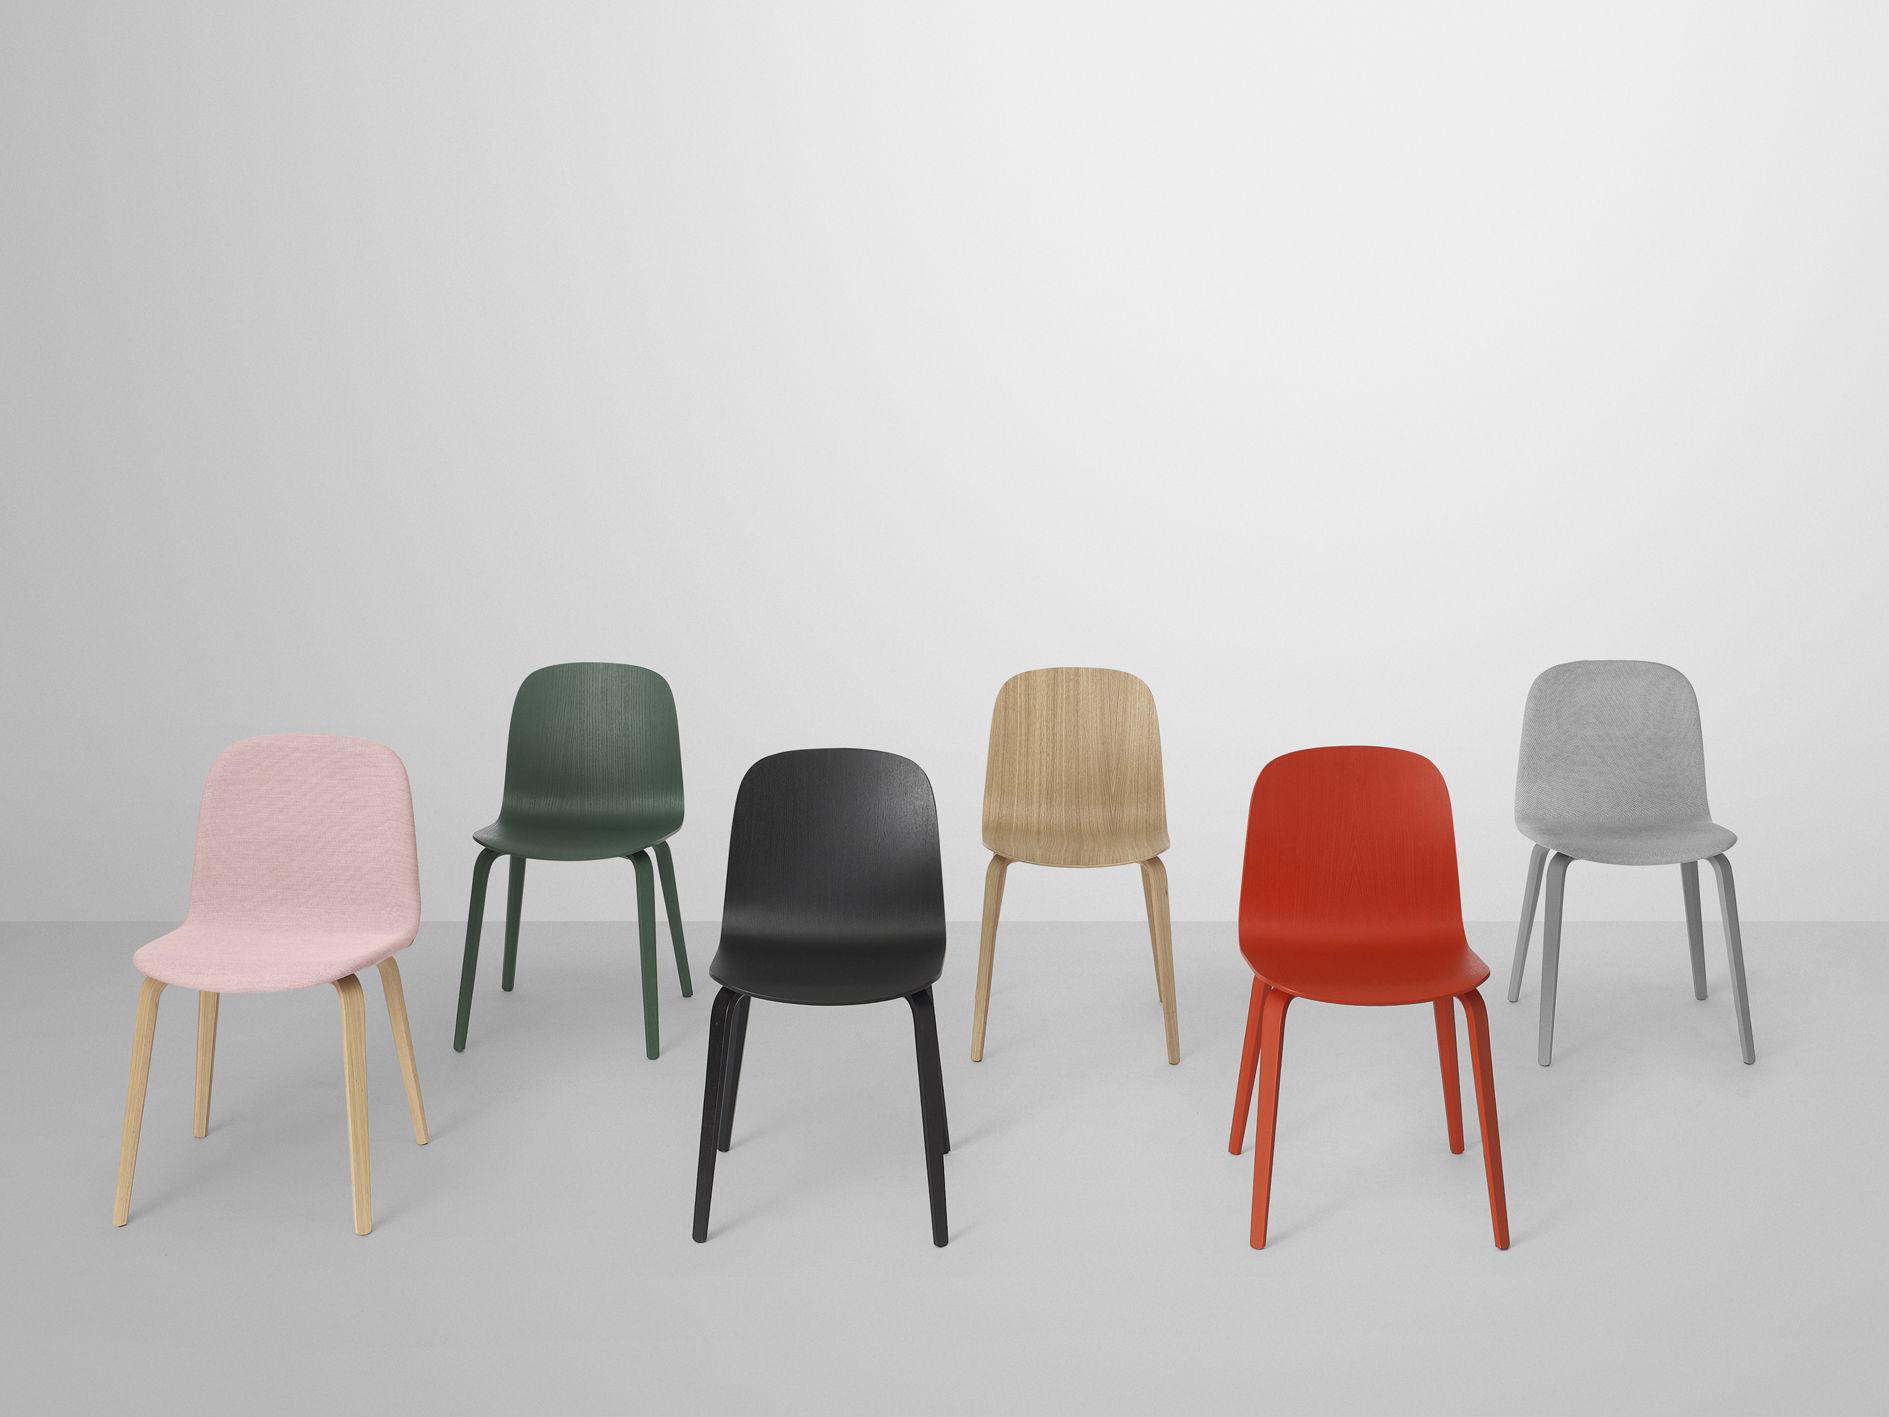 visu chair wood legs solid oak by muuto. Black Bedroom Furniture Sets. Home Design Ideas